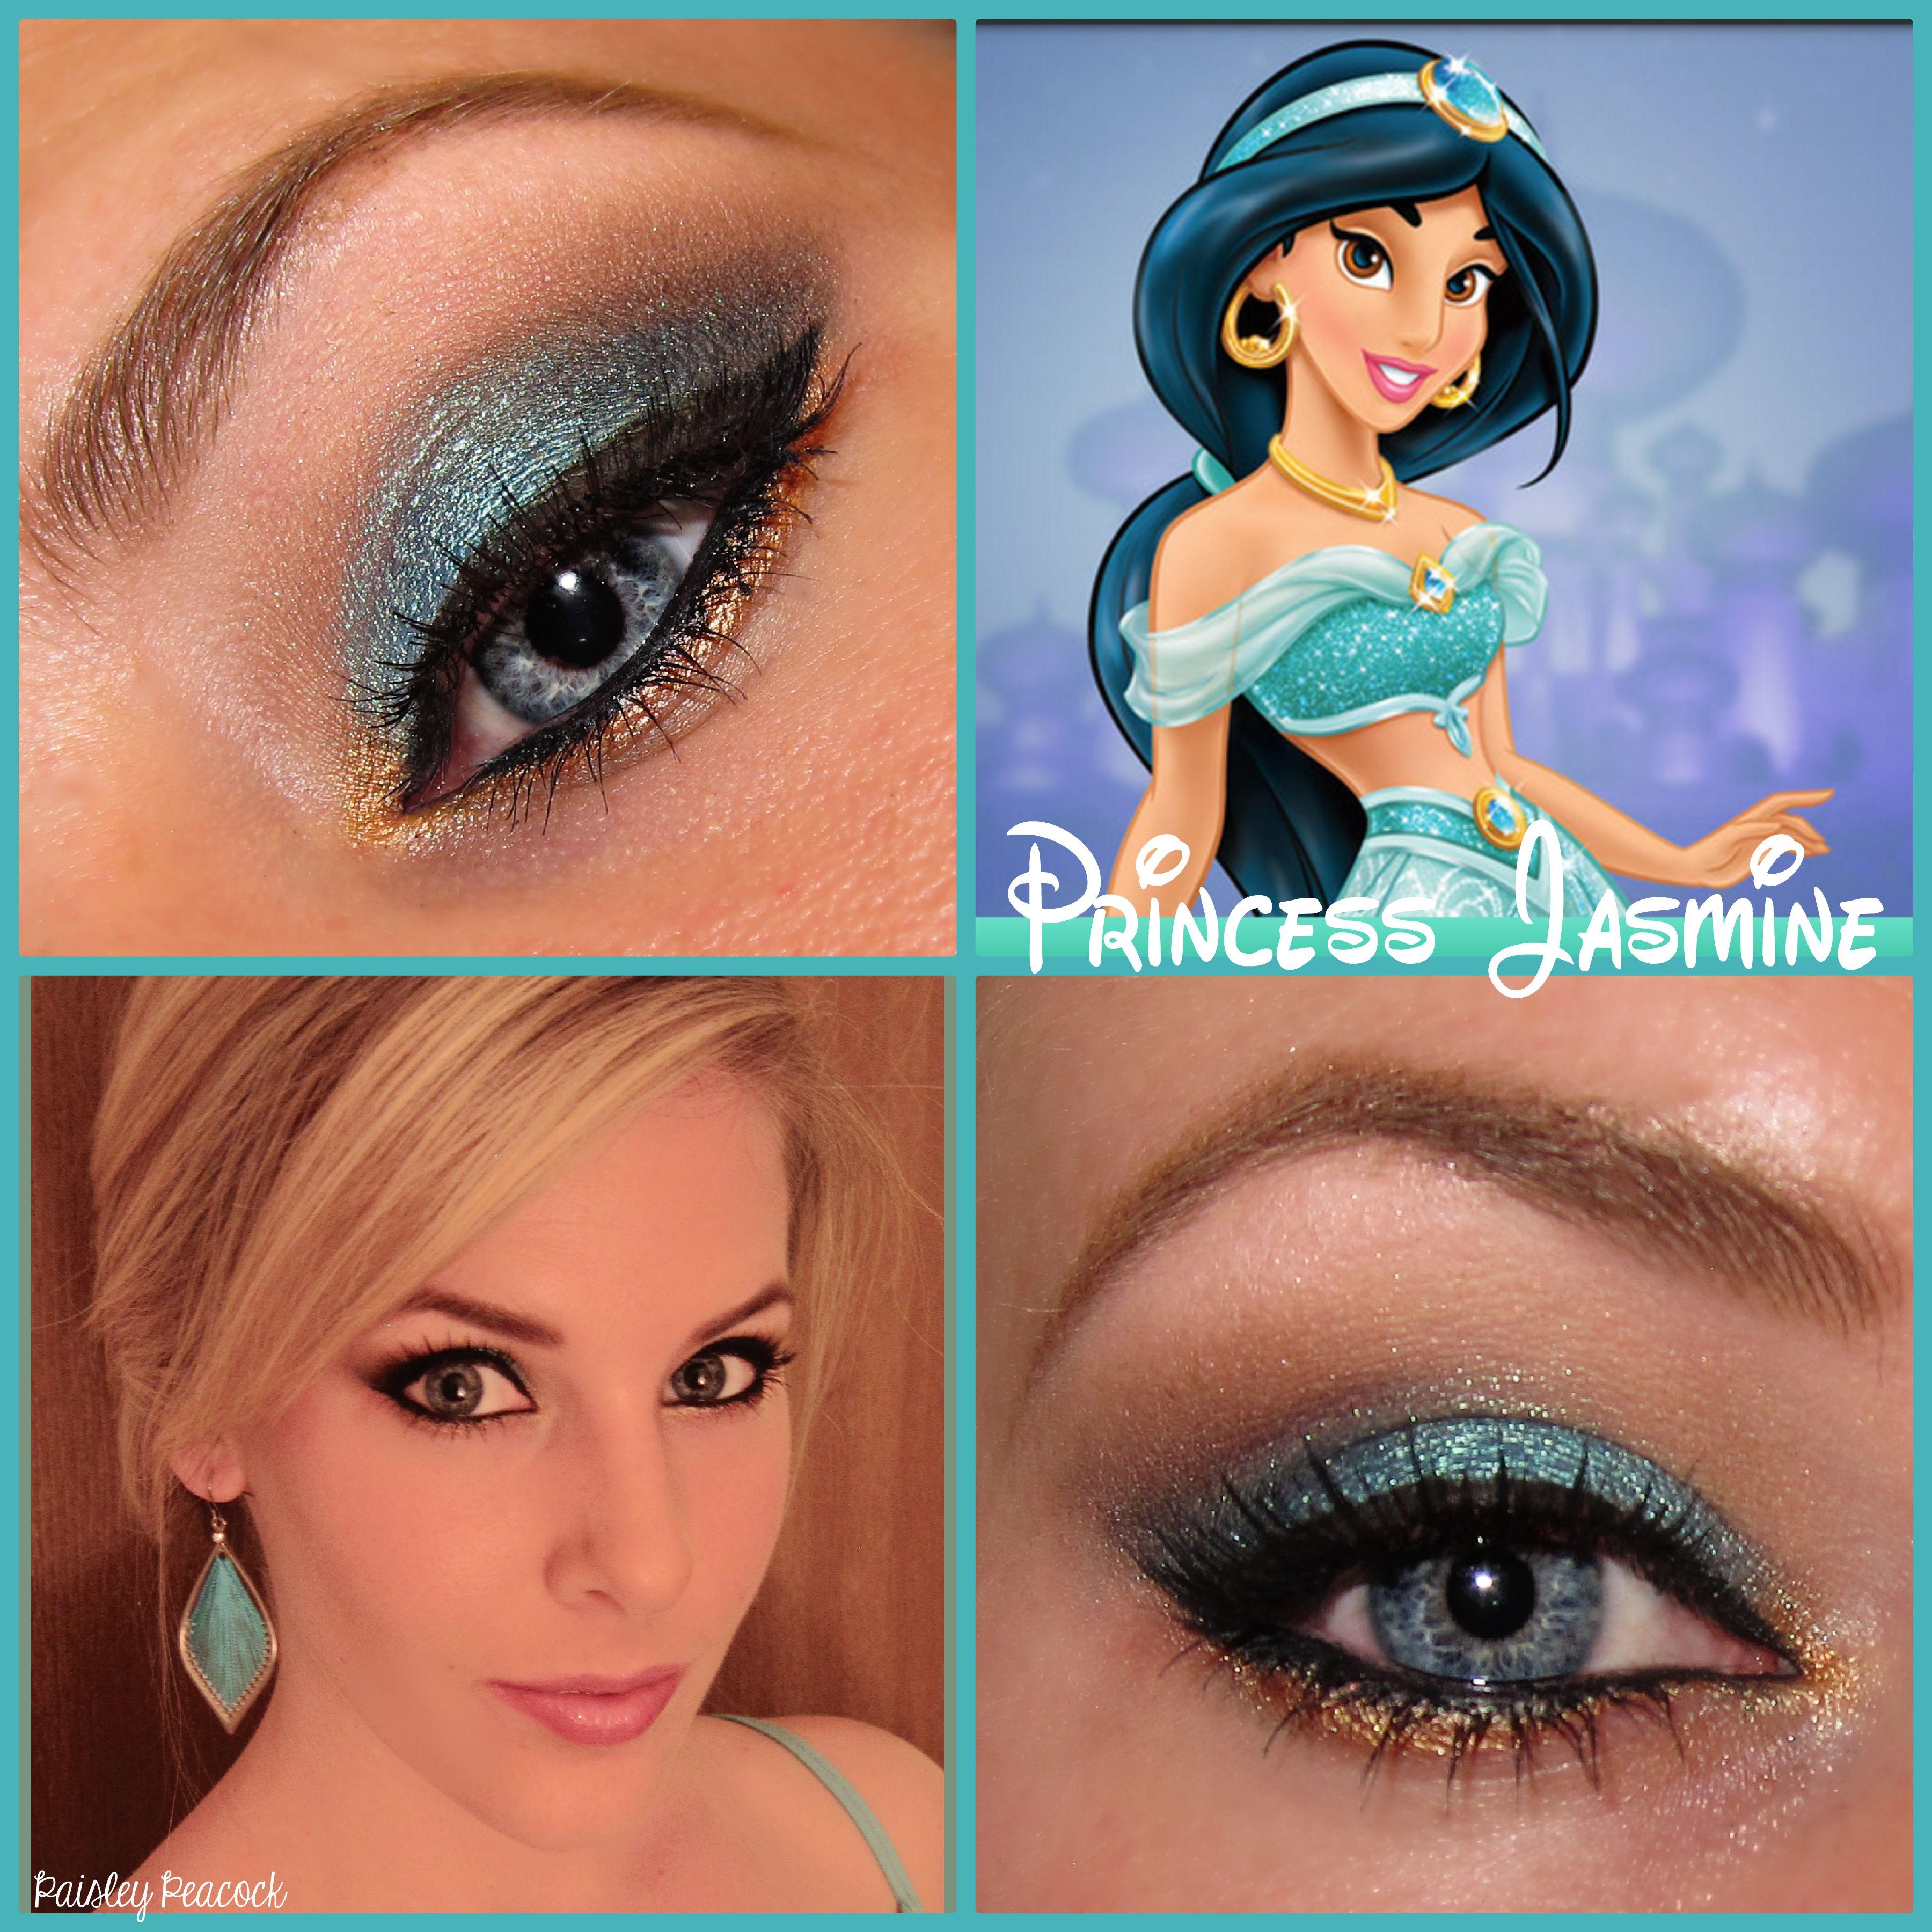 Jasmine Inspired Makeup Paisley Peacock Disney wedding